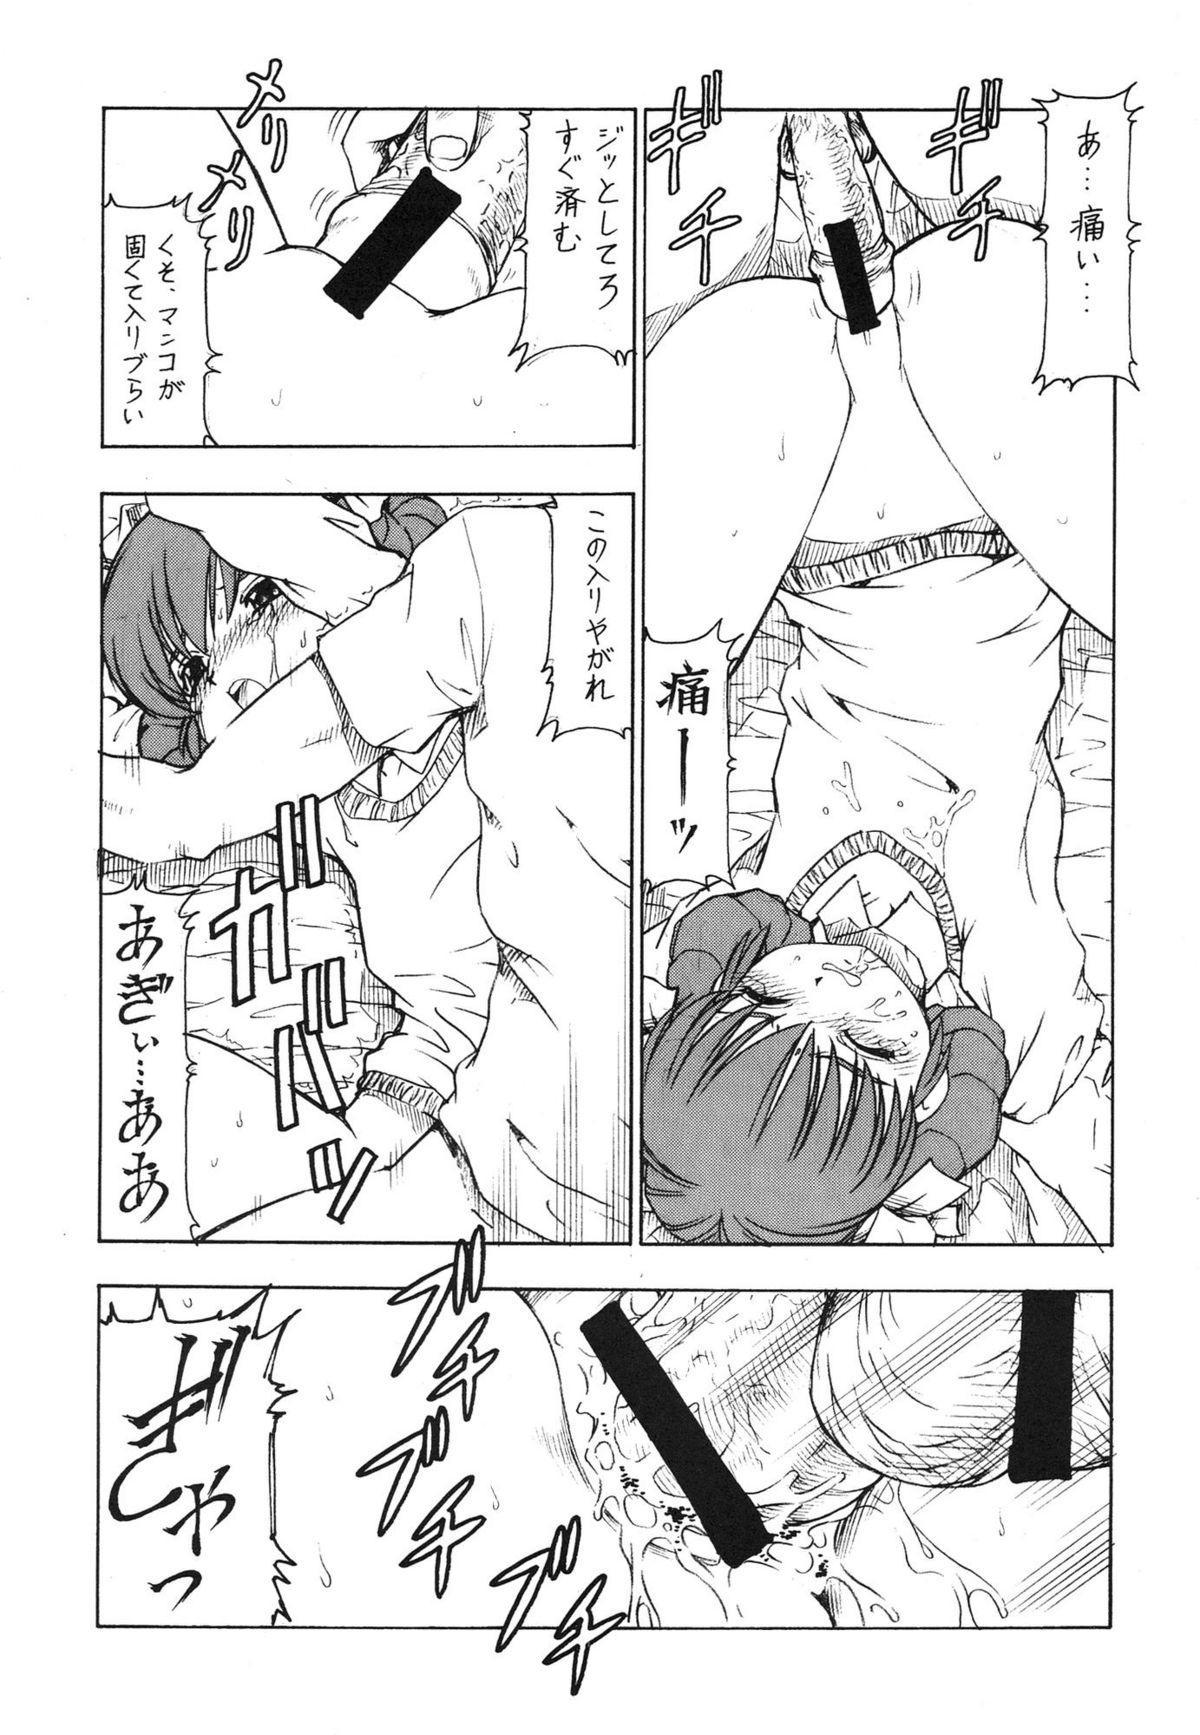 GPM.XXX Animation Moegiiro no Namida - Tear Drops 38